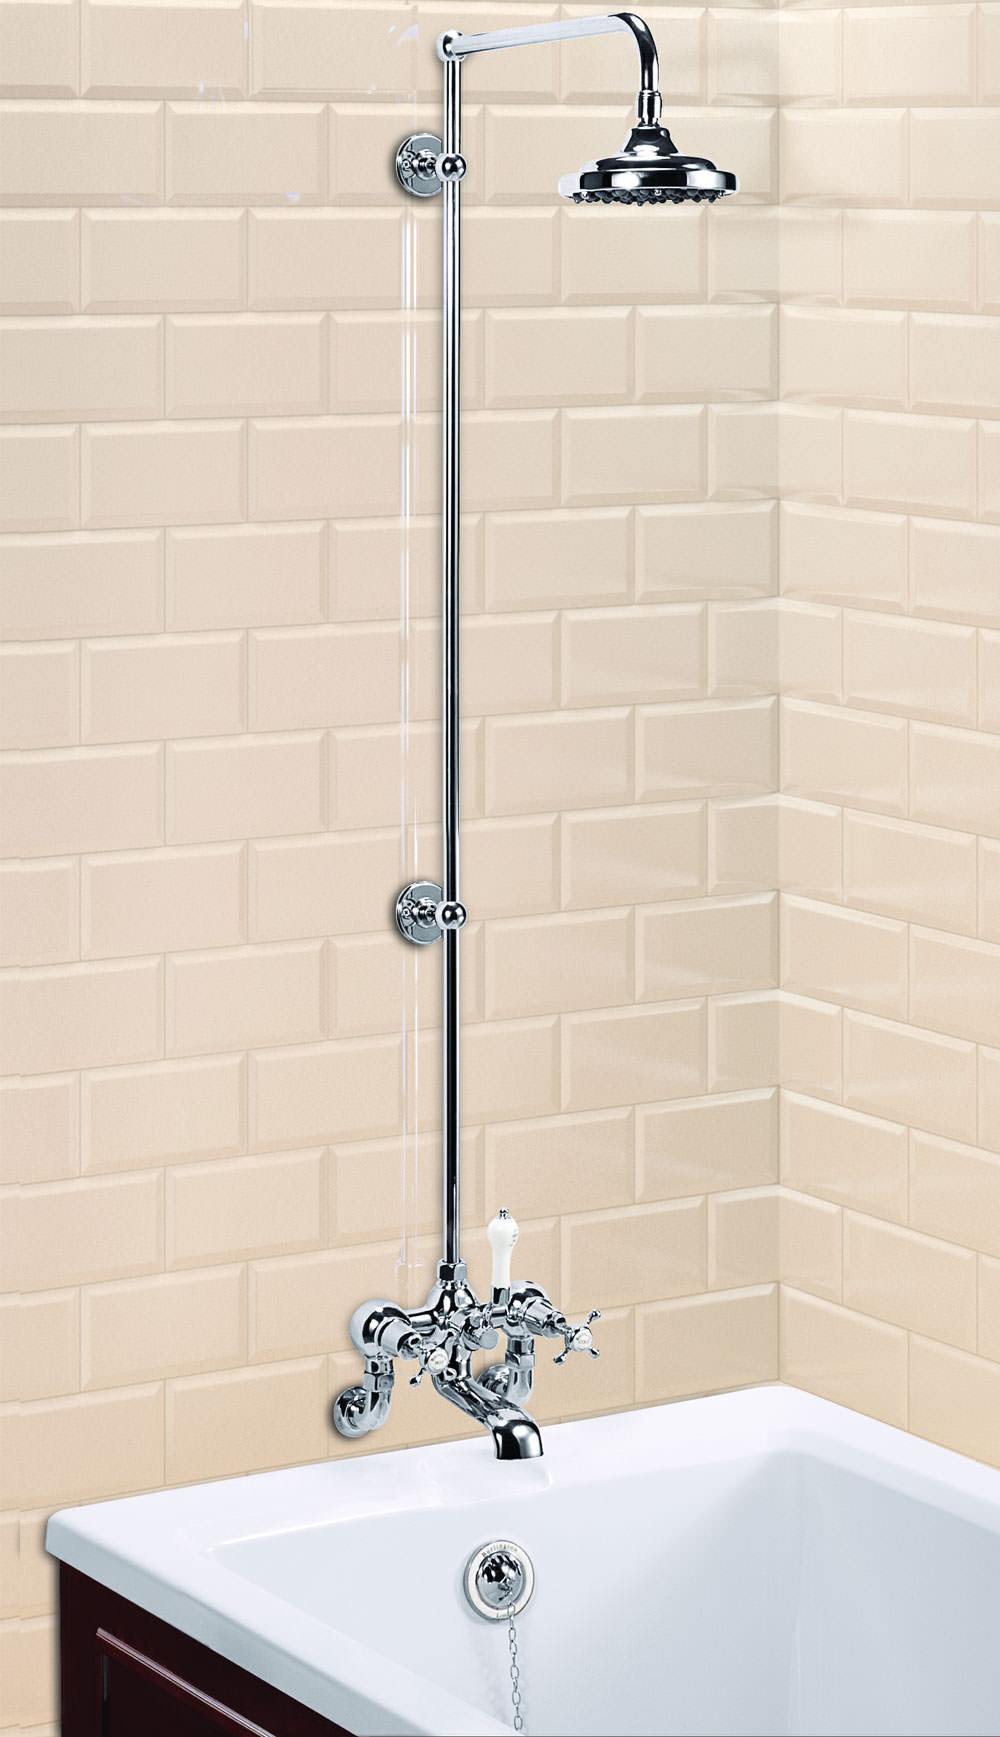 Burlington Wall Mounted Bath Shower Mixer With Rigid Riser